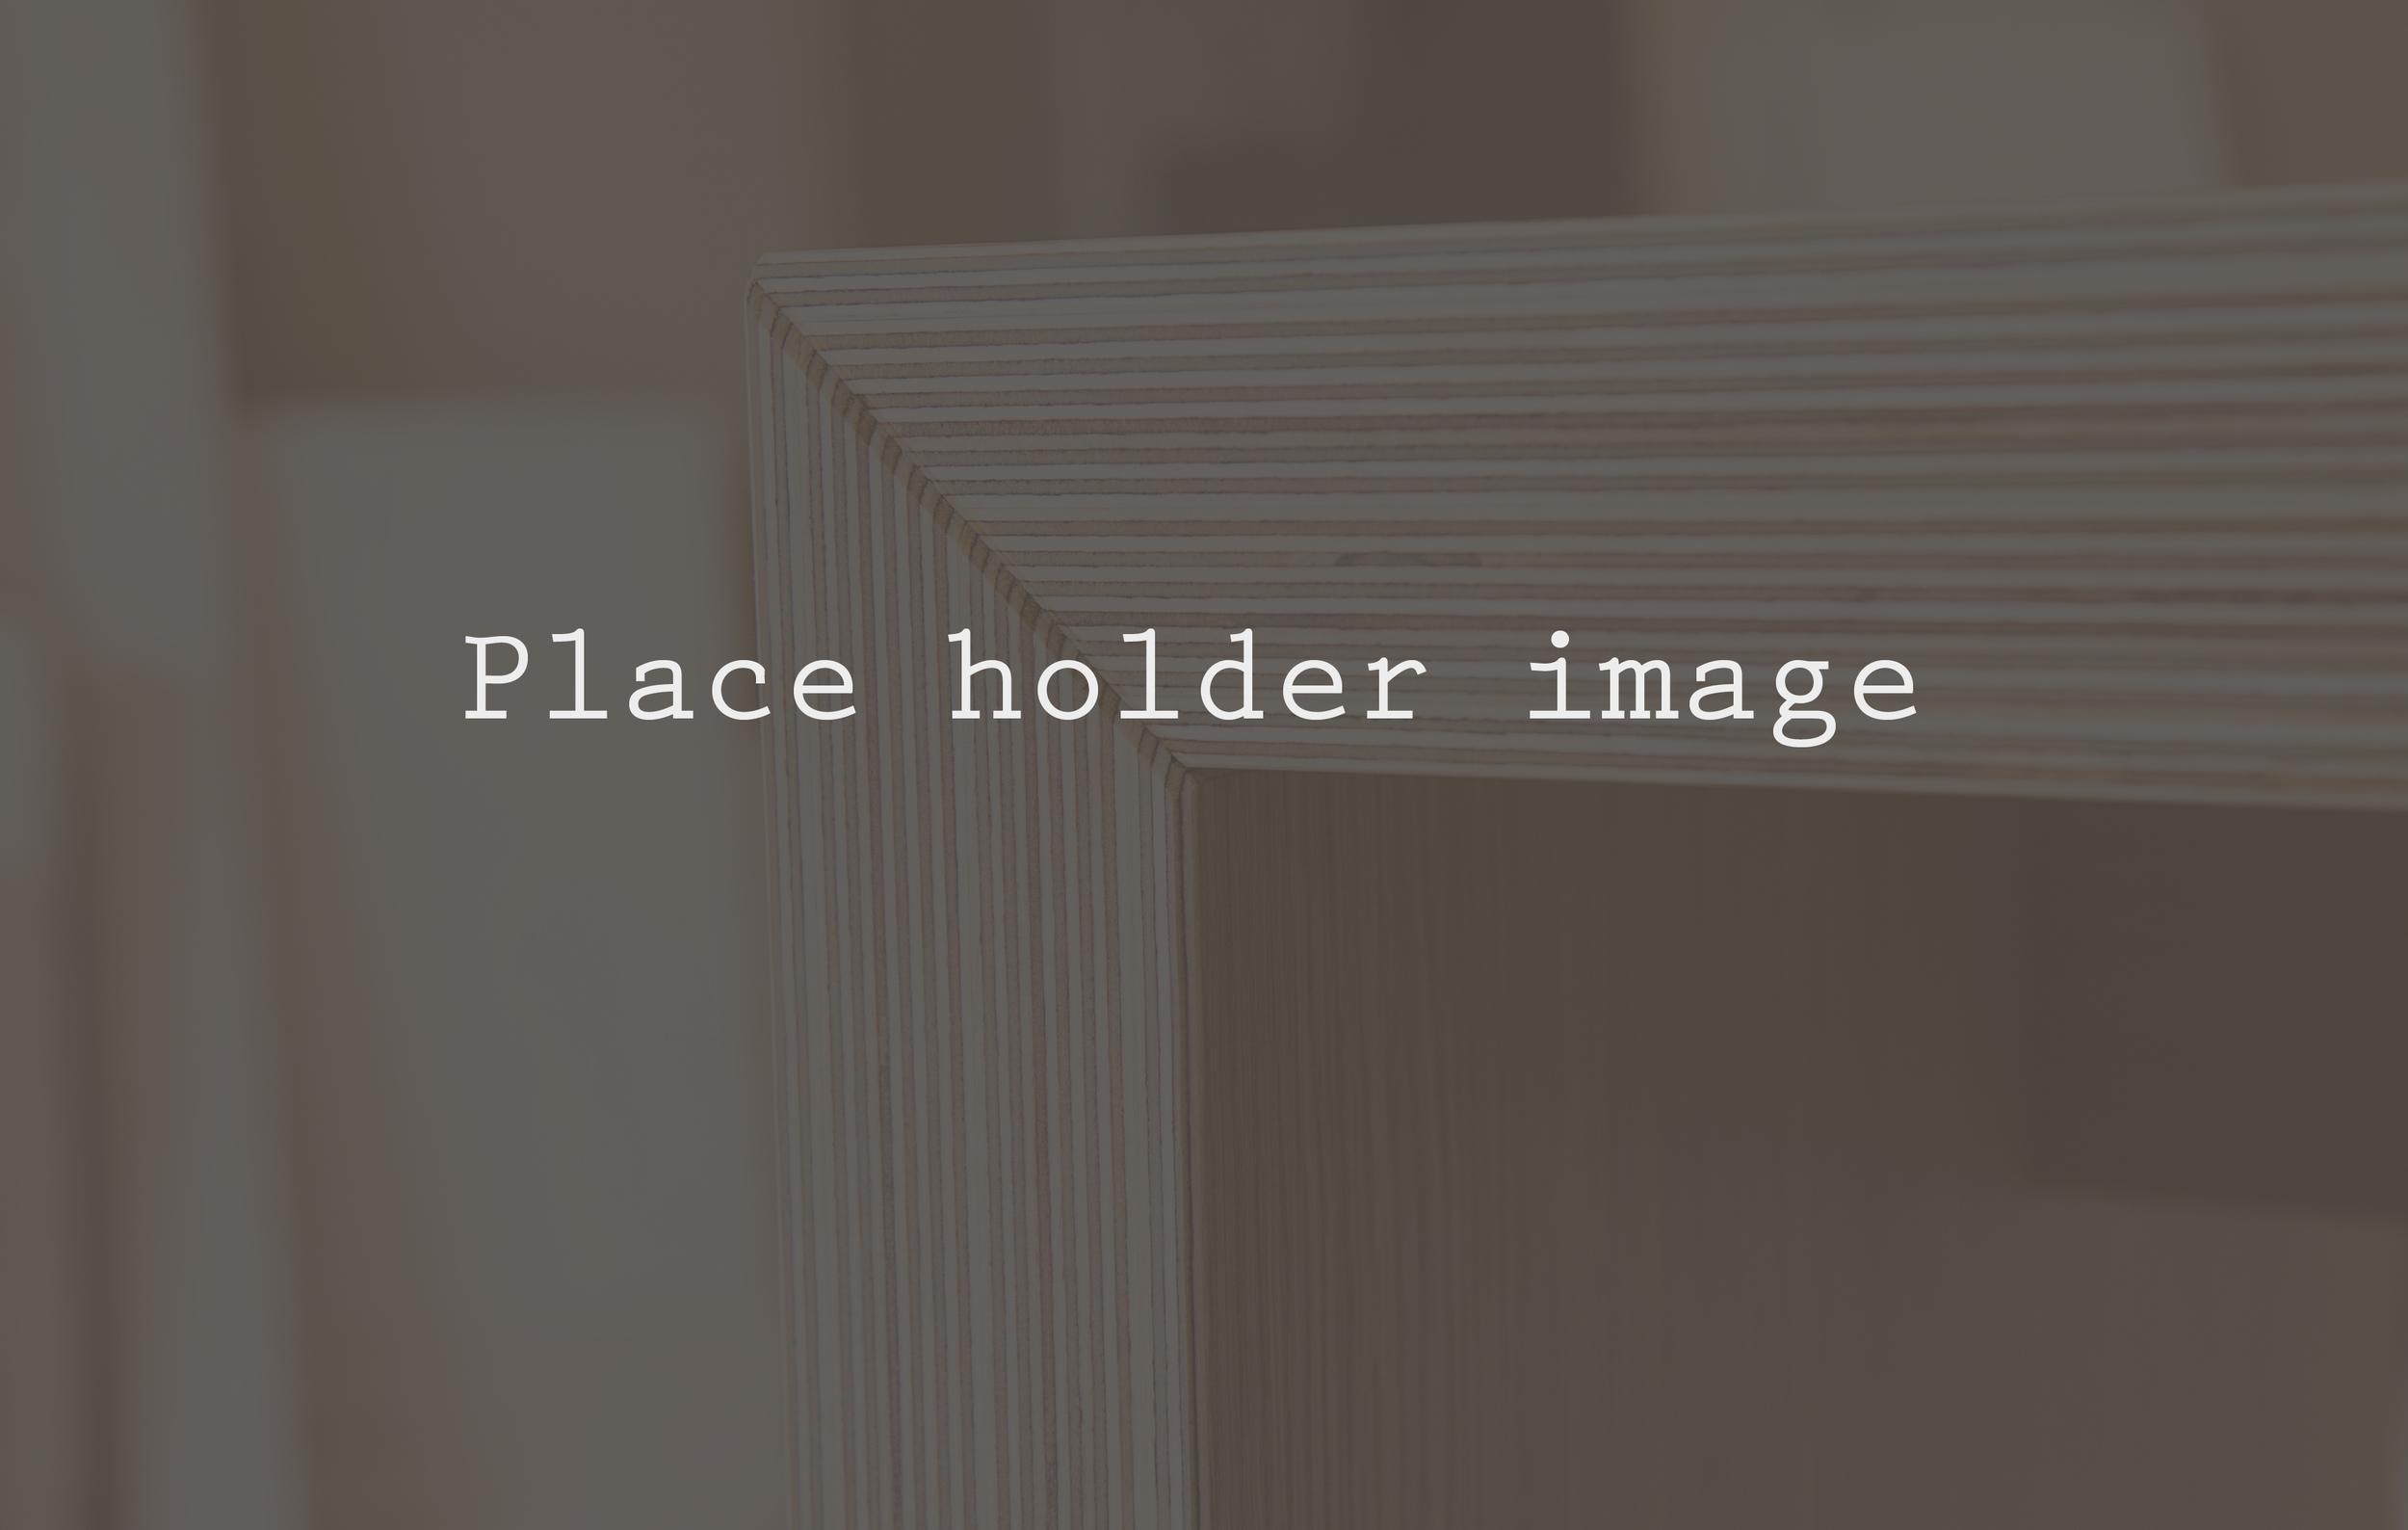 place holder image 3.jpg